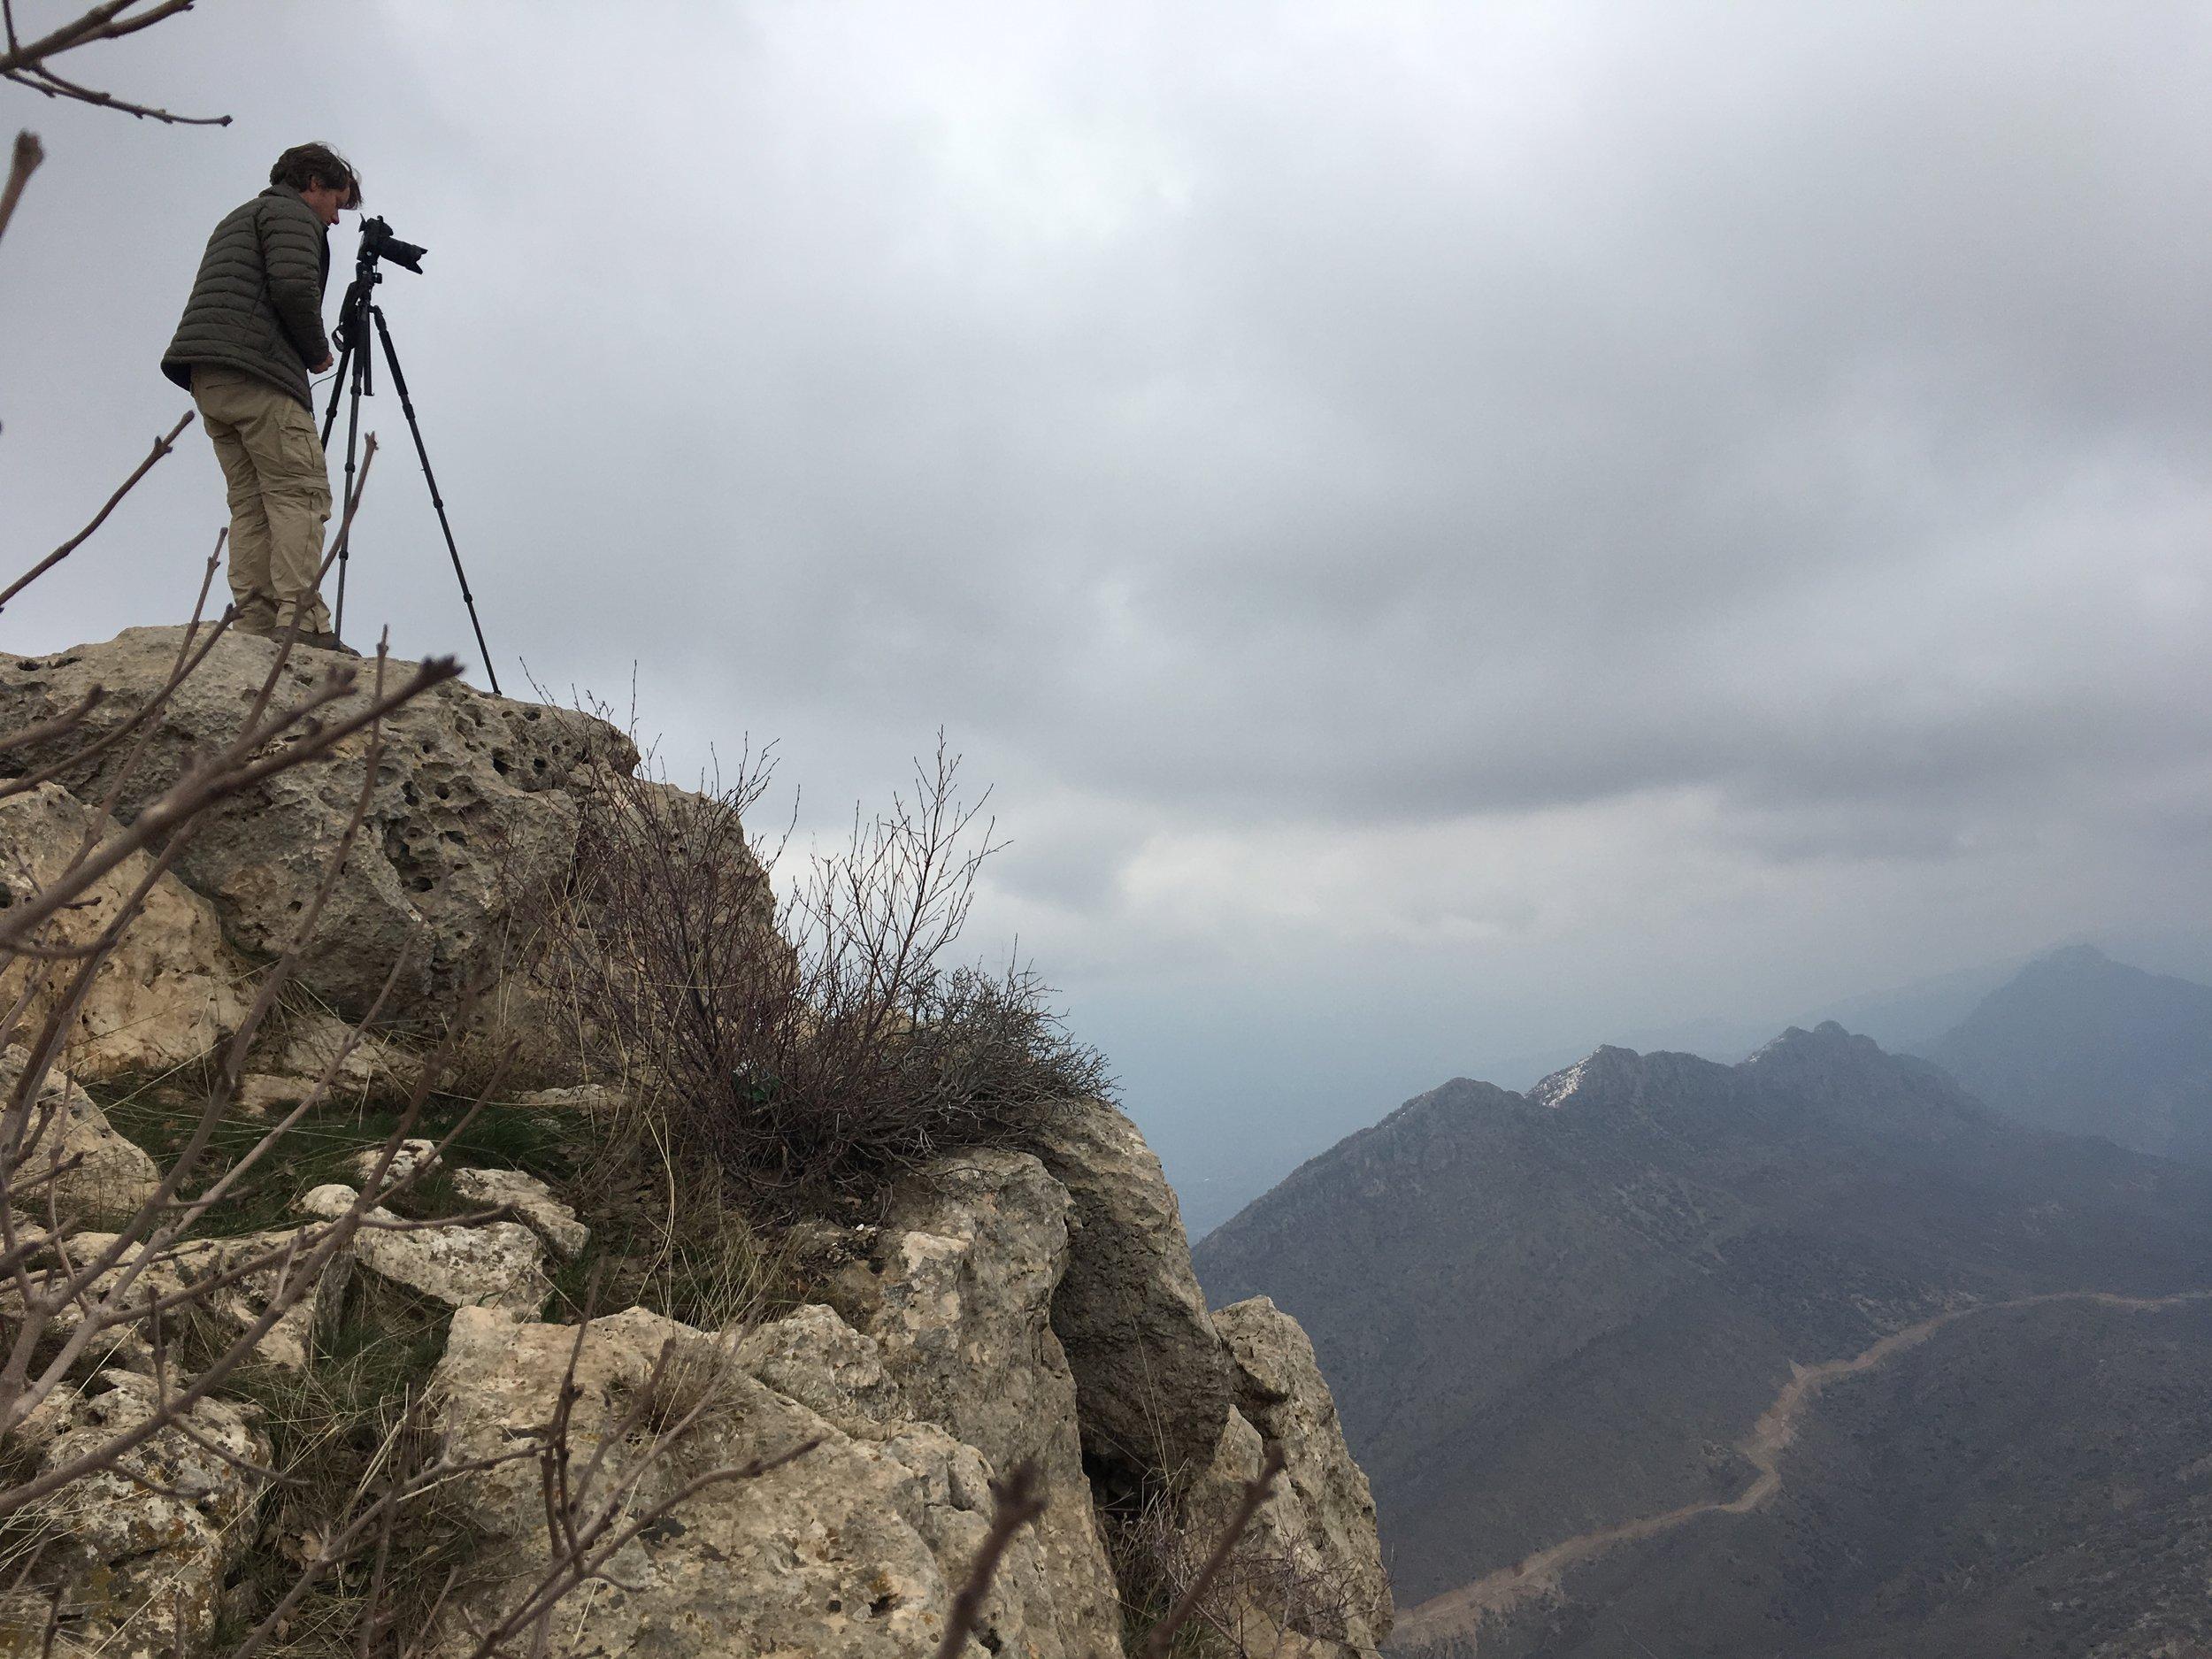 at Halgord Mountain